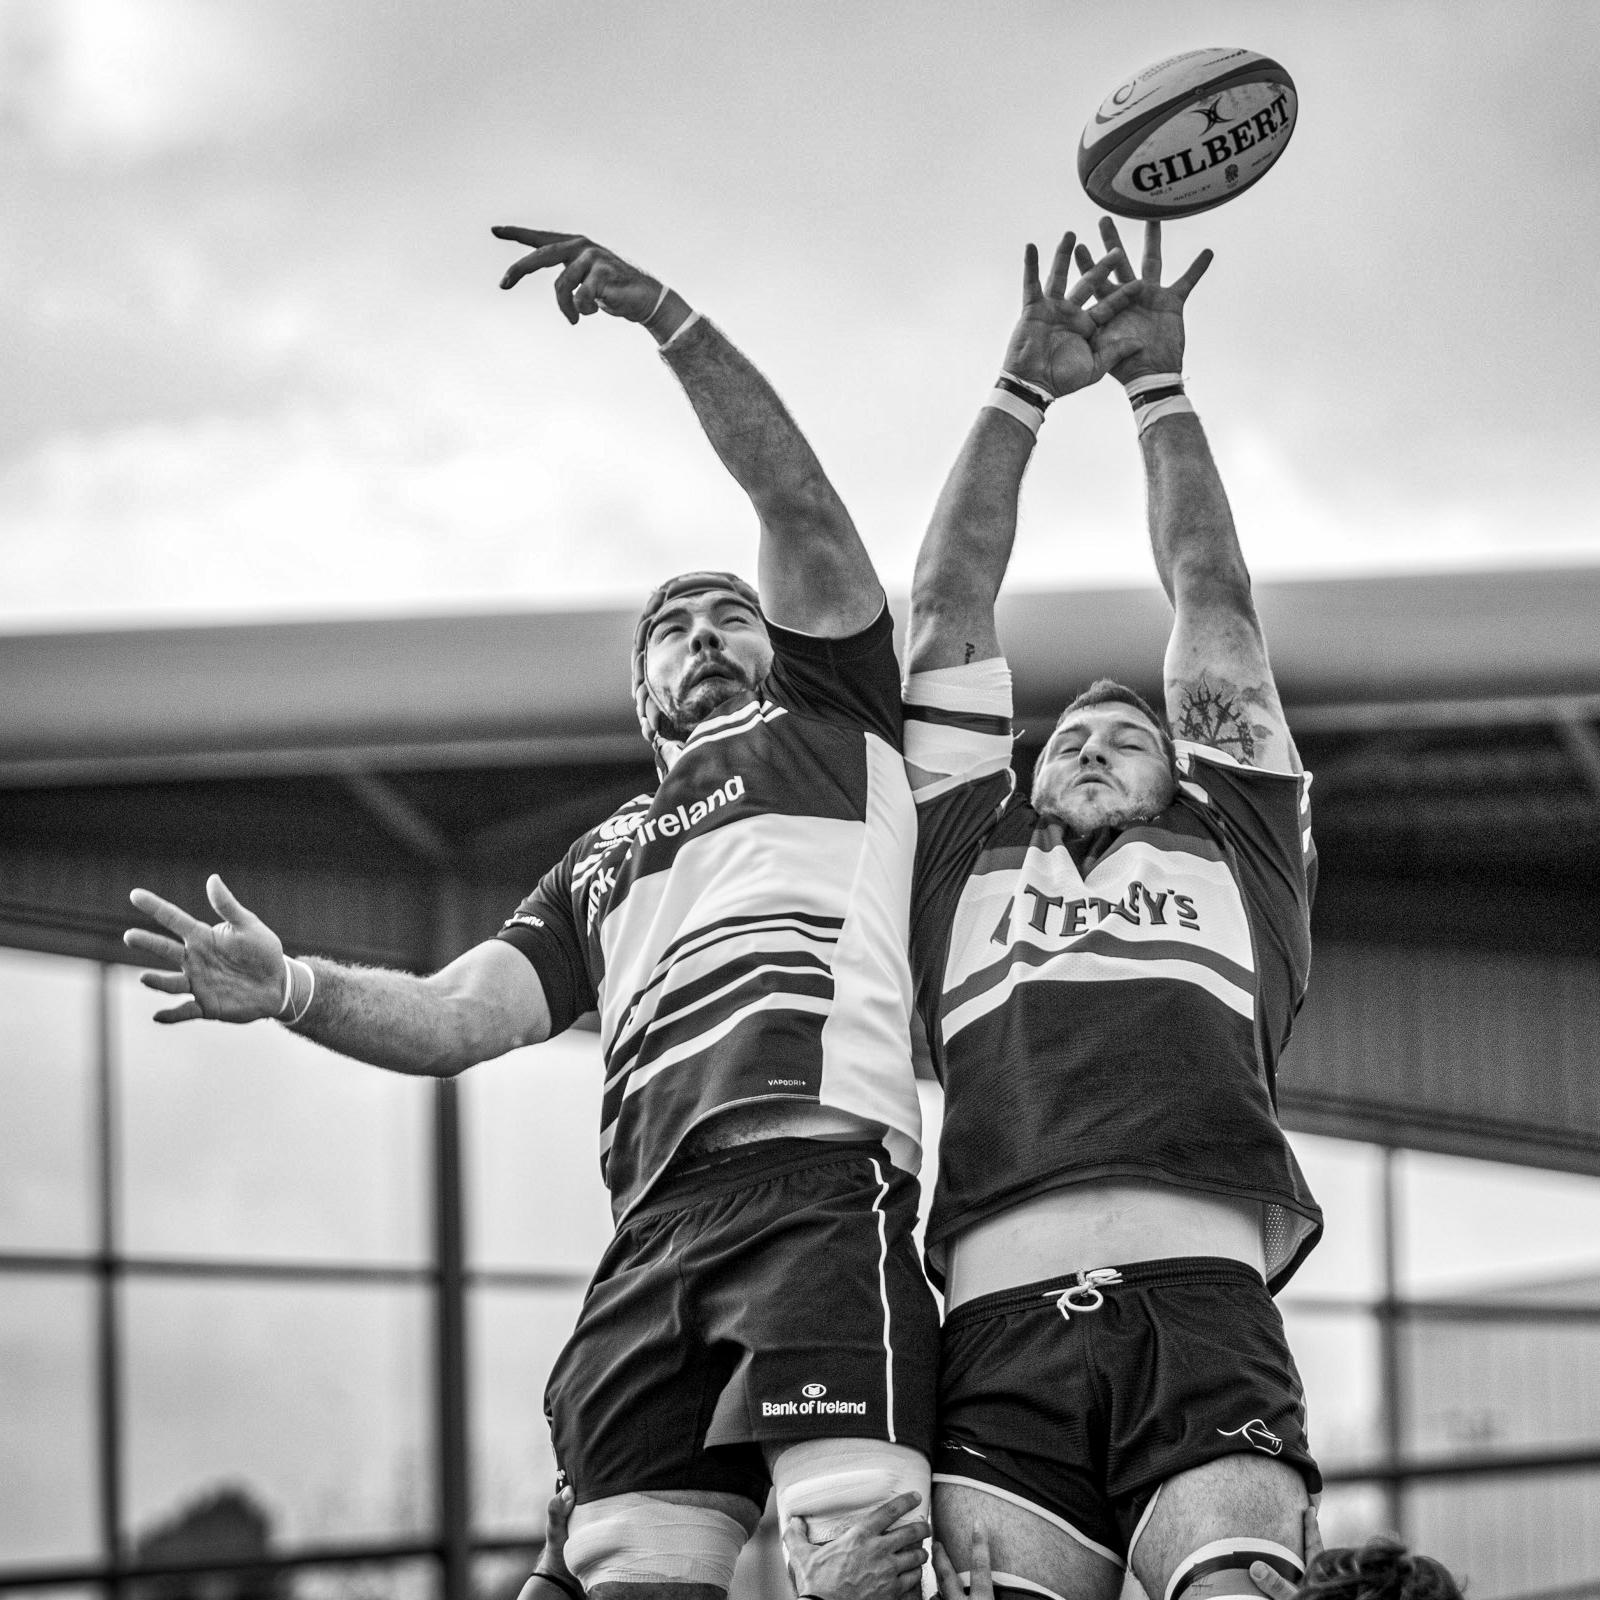 Knights' Matt Challinor stretches at a lineout ball